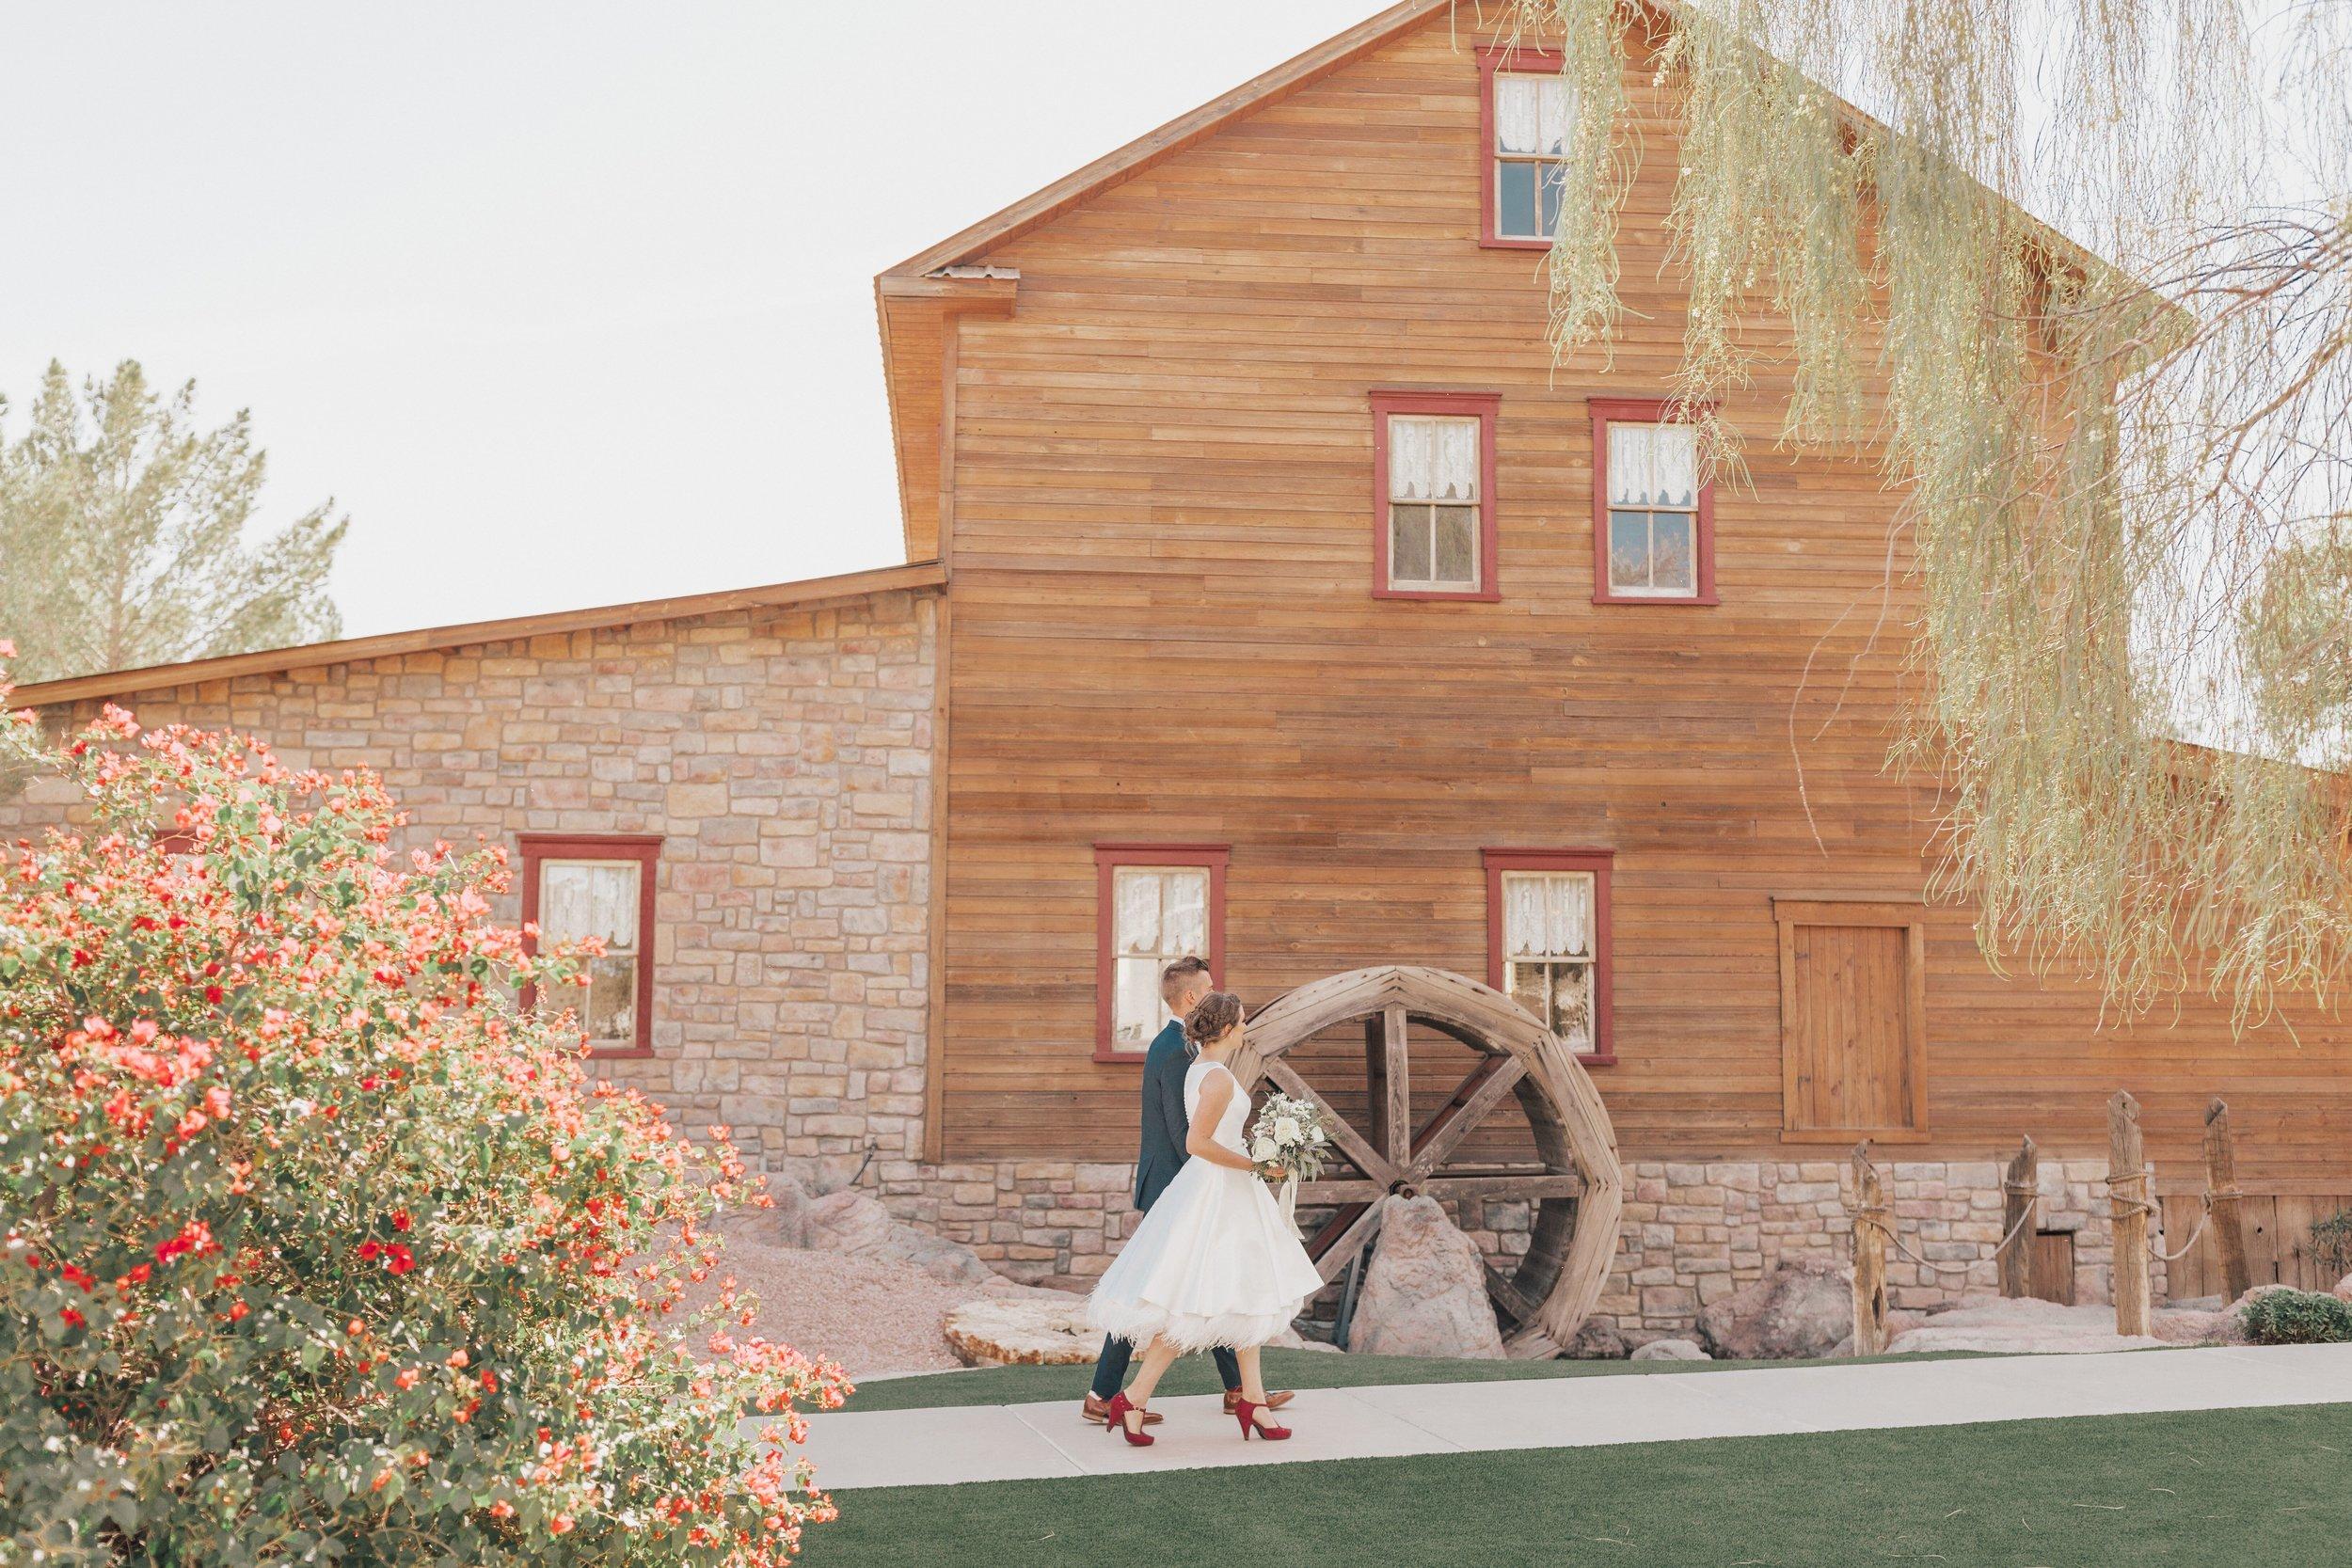 Arizona_Wedding_TheMill_Bridal_BrideAndGroom_redshoes